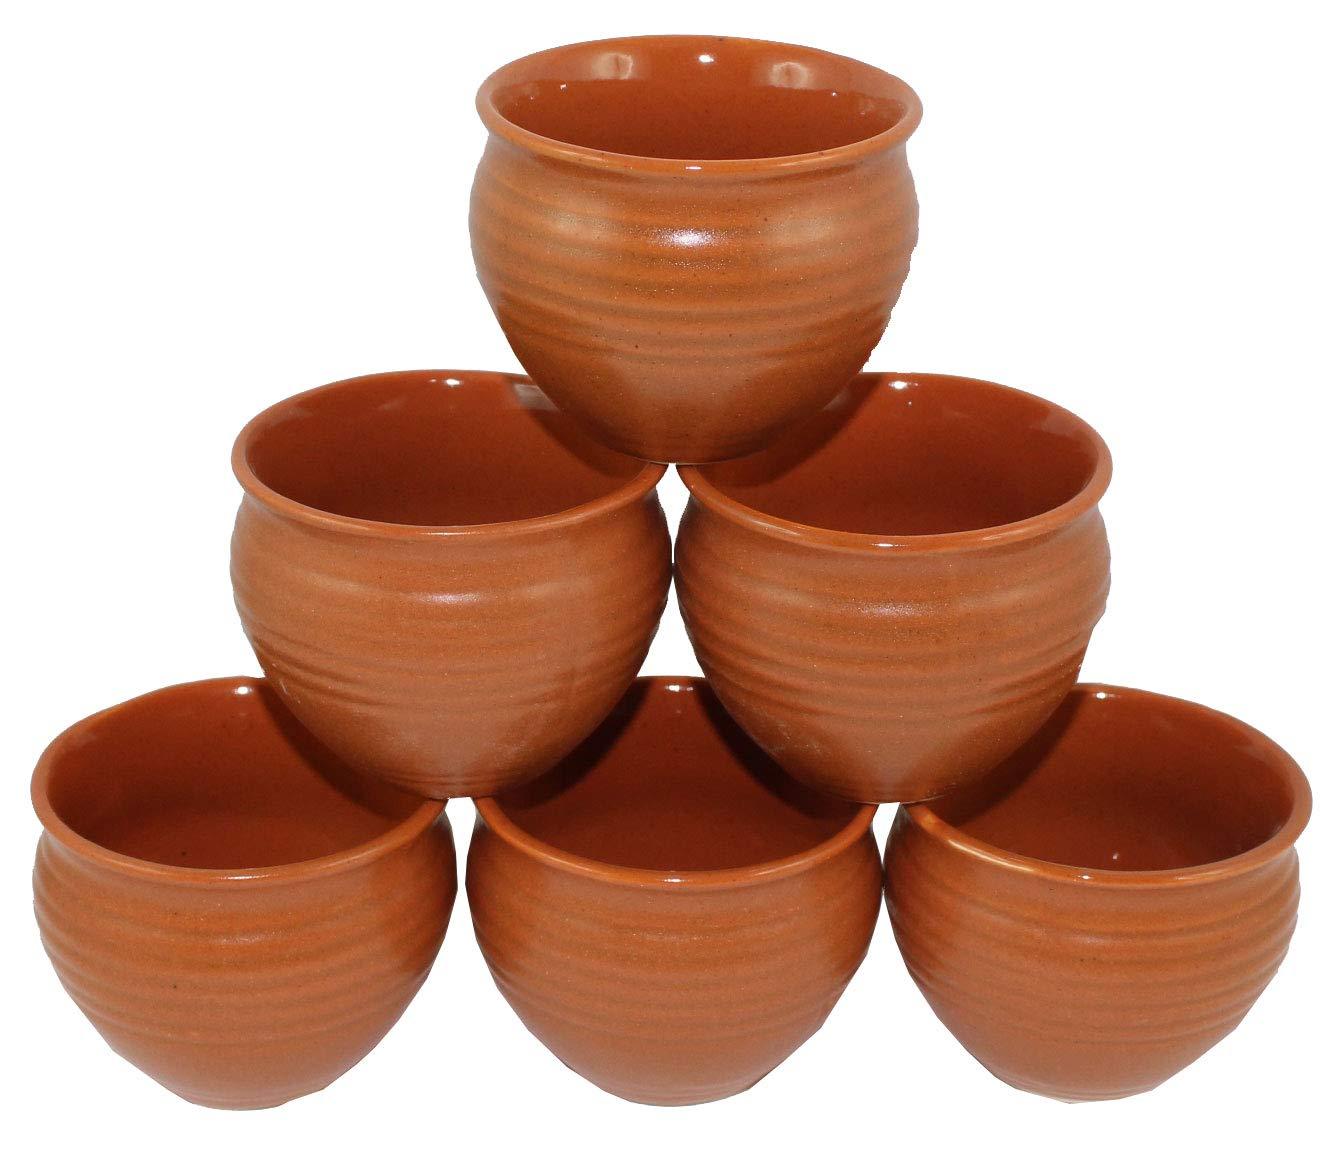 4.0 oz Odishabazaar Ceramic 6 Pc Kulhar Kulhad Cups Traditional Indian Chai Tea Cup Set of 6